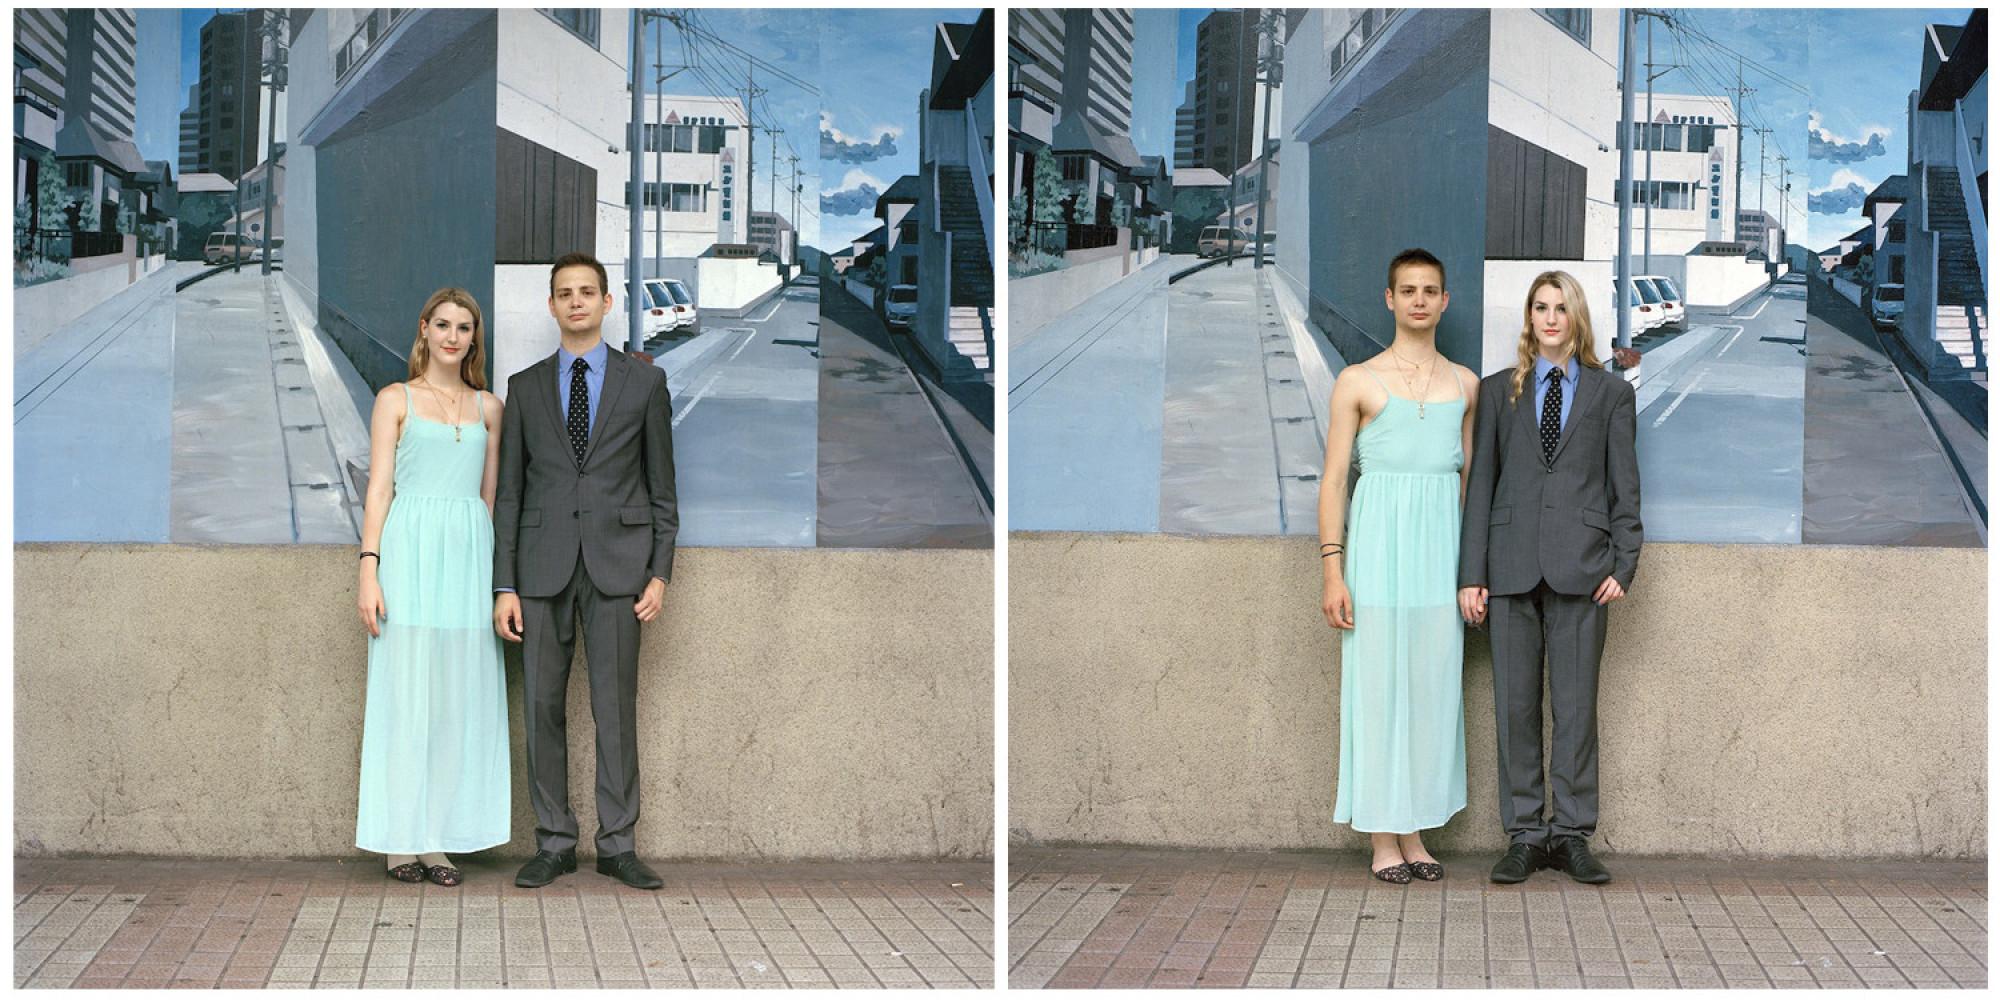 Switcheroo,\' Photo Series By Hana Pesut, Explores Gender Role ...